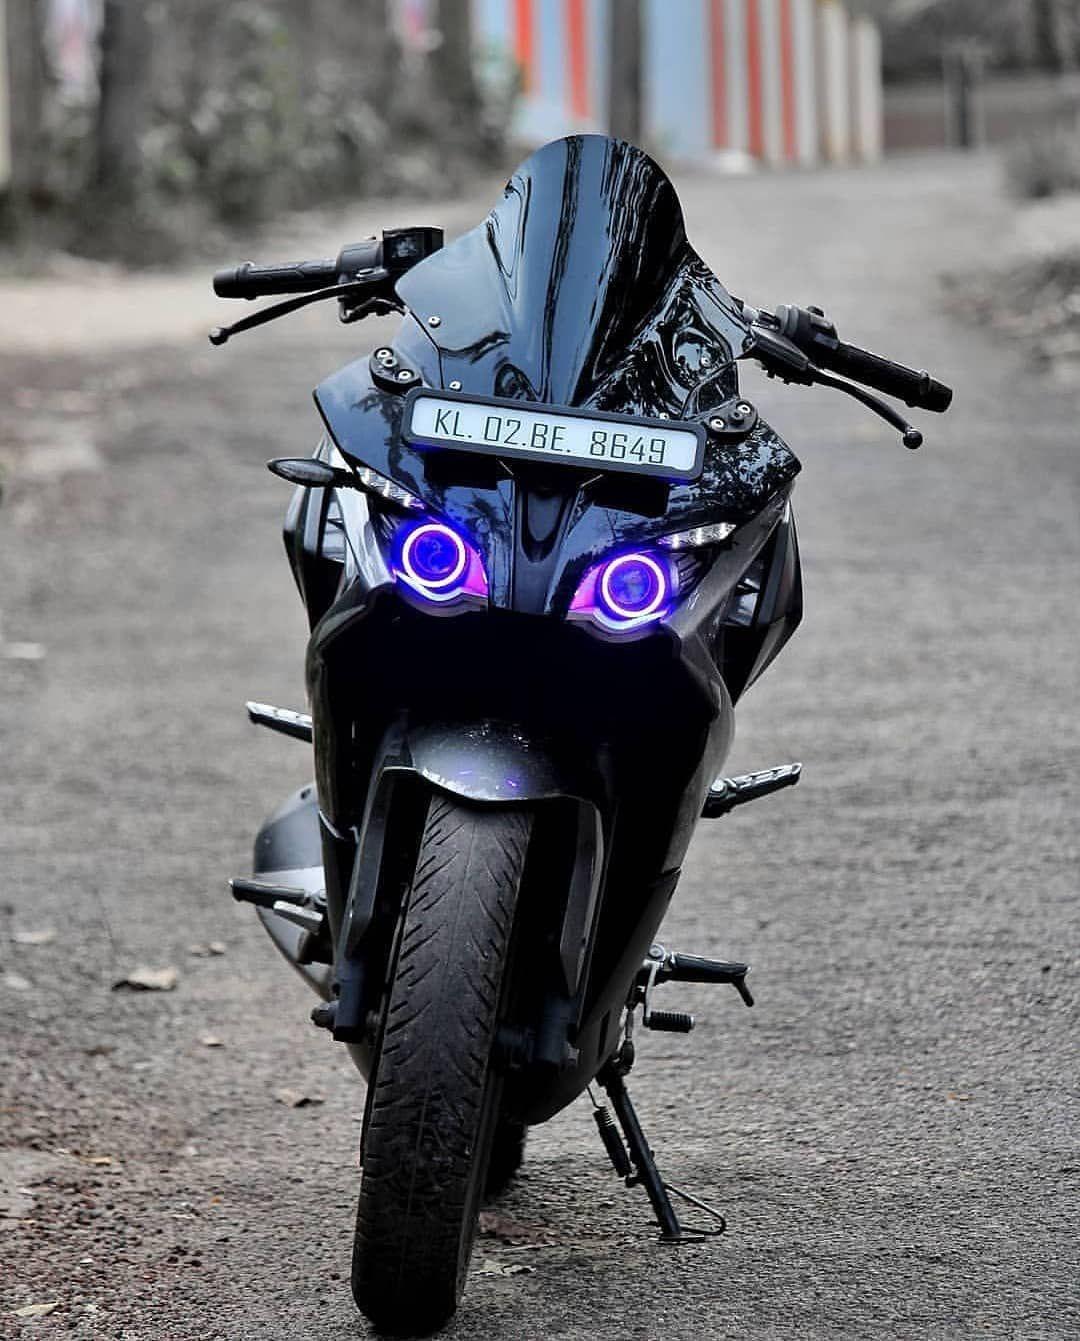 Pulsar 200 Rs Fans Bajaj Rs 200 200rs Bike Biker Bikergang